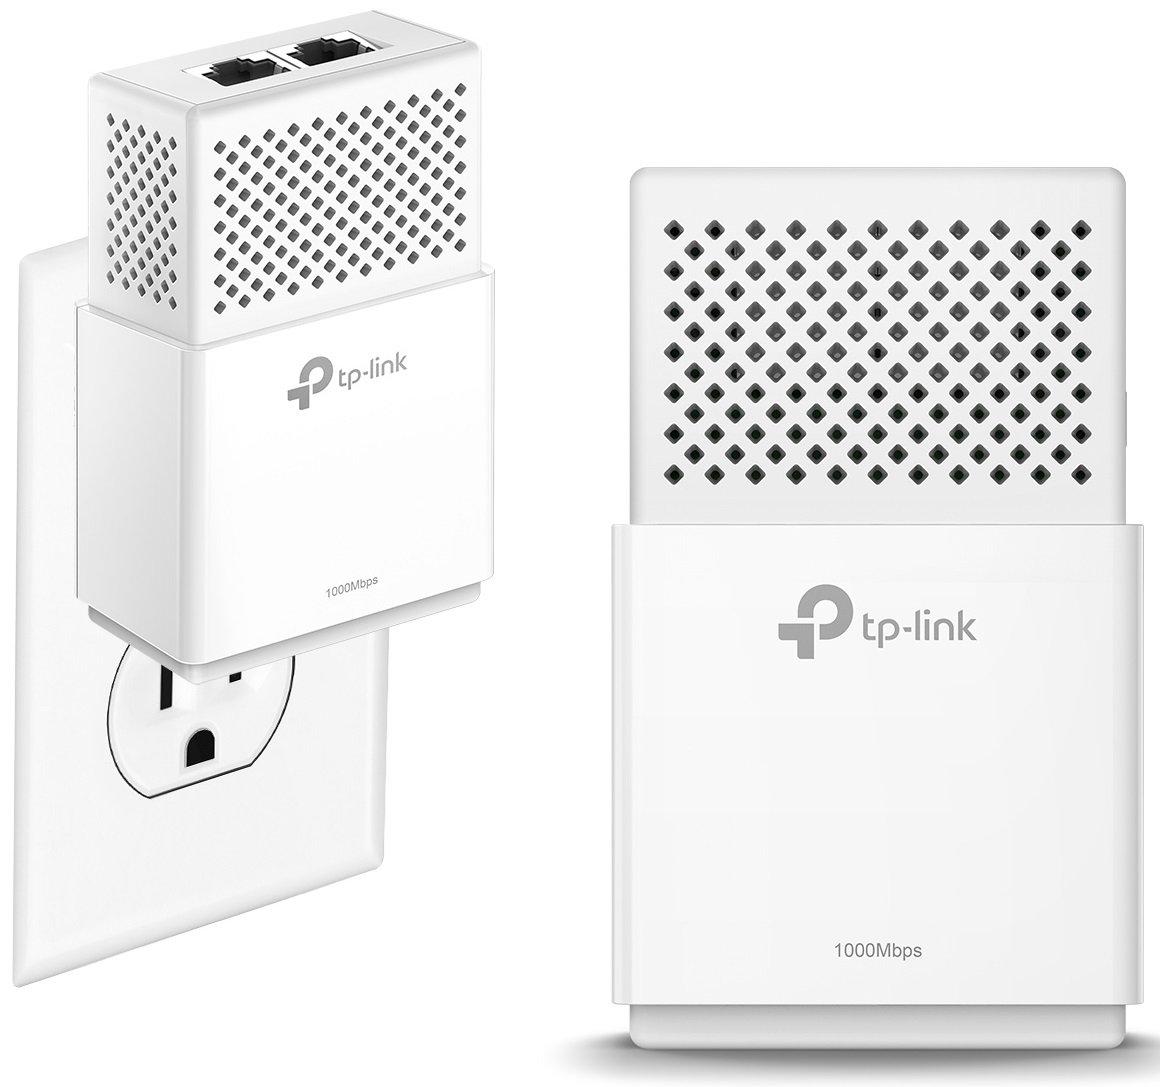 TP-Link TL-PA8010 KIT AV1200 1-Port Gigabit Powerline Adapter KIT, up to 1200Mbps, Plug and Play